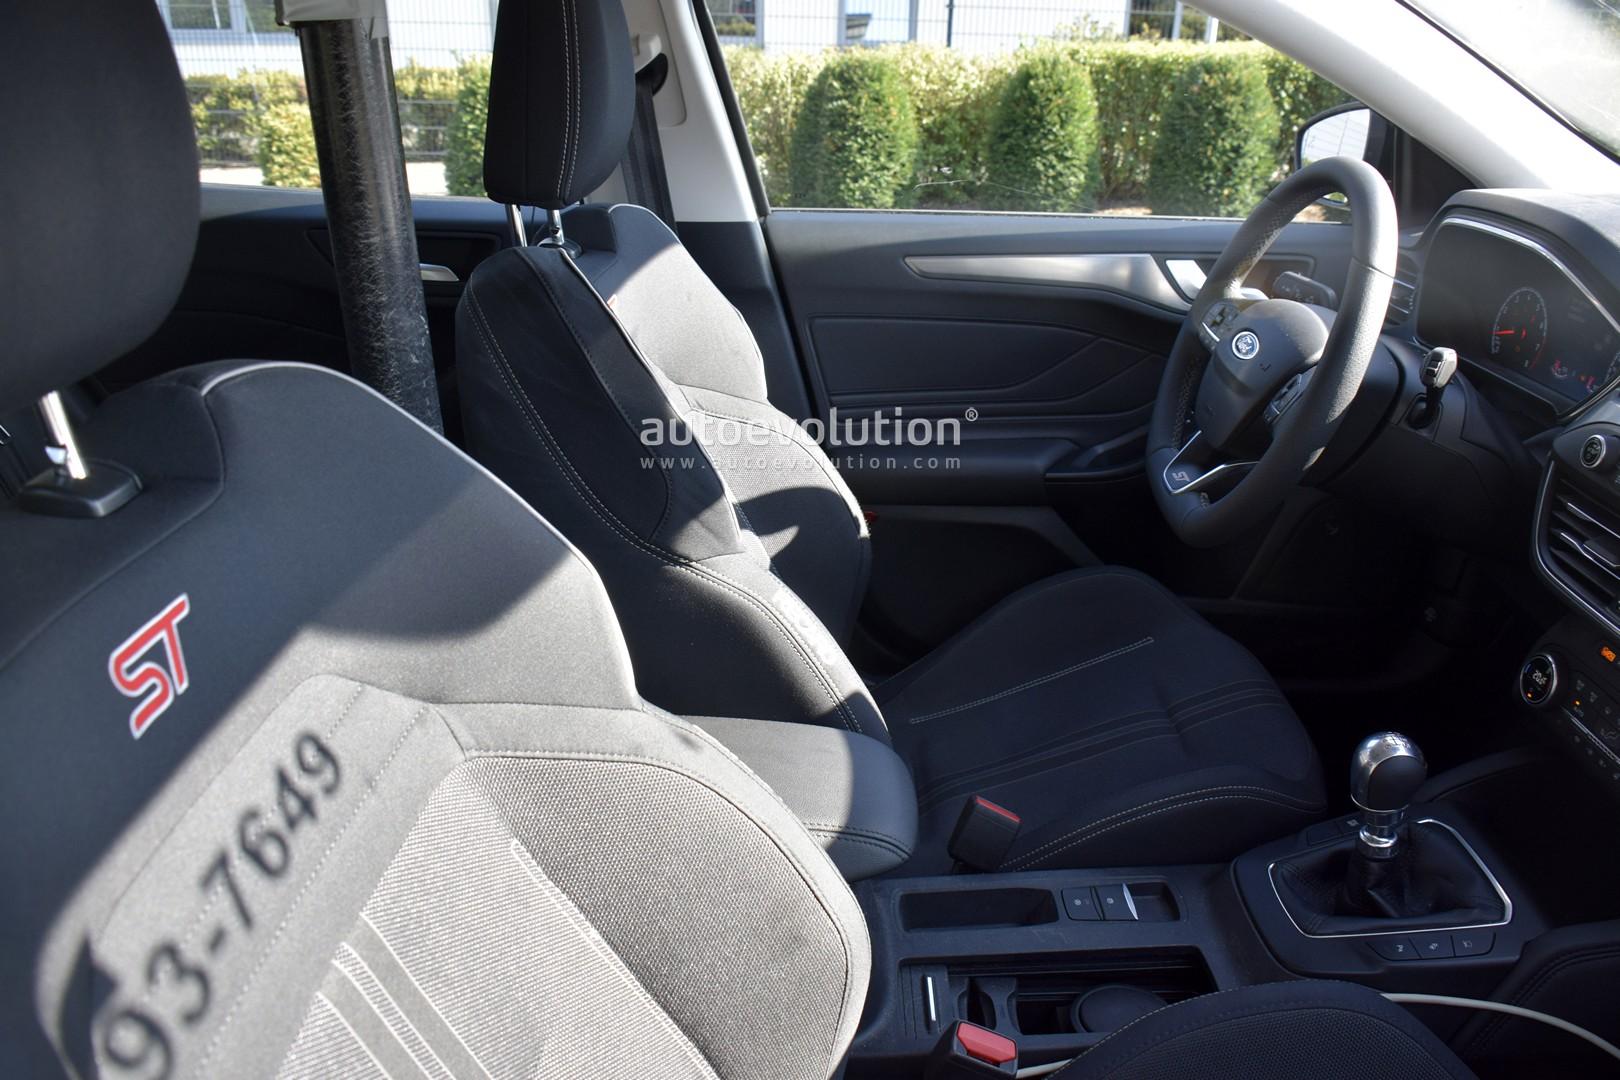 2020 Ford Focus St Reveals Interior In Latest Spyshots Autoevolution